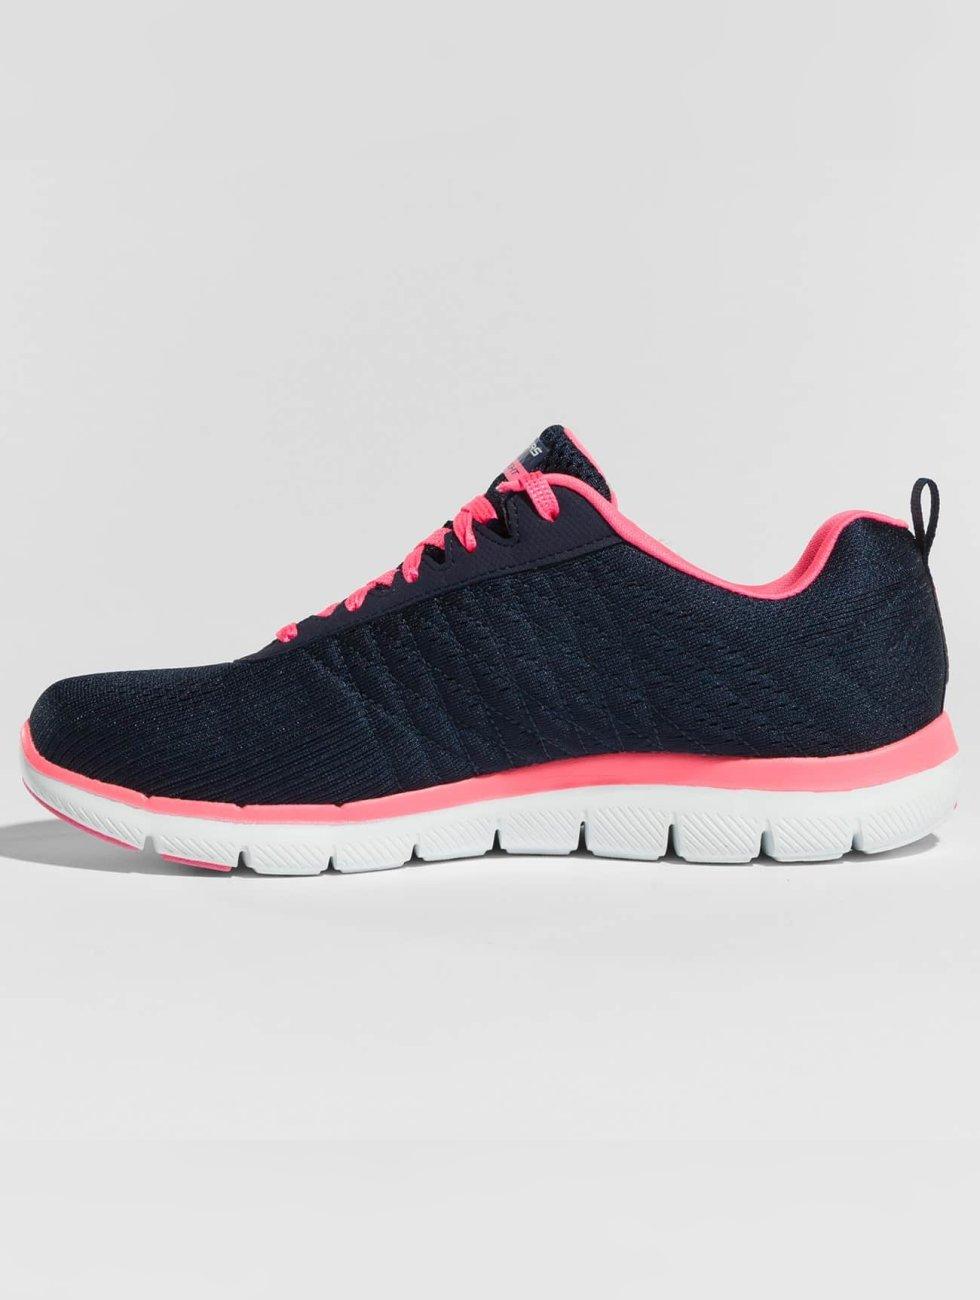 Skechers Scarpa / Sneaker Rompere Appello Flex Libero In Blu 2.0 461 502 EaZ4QrIm